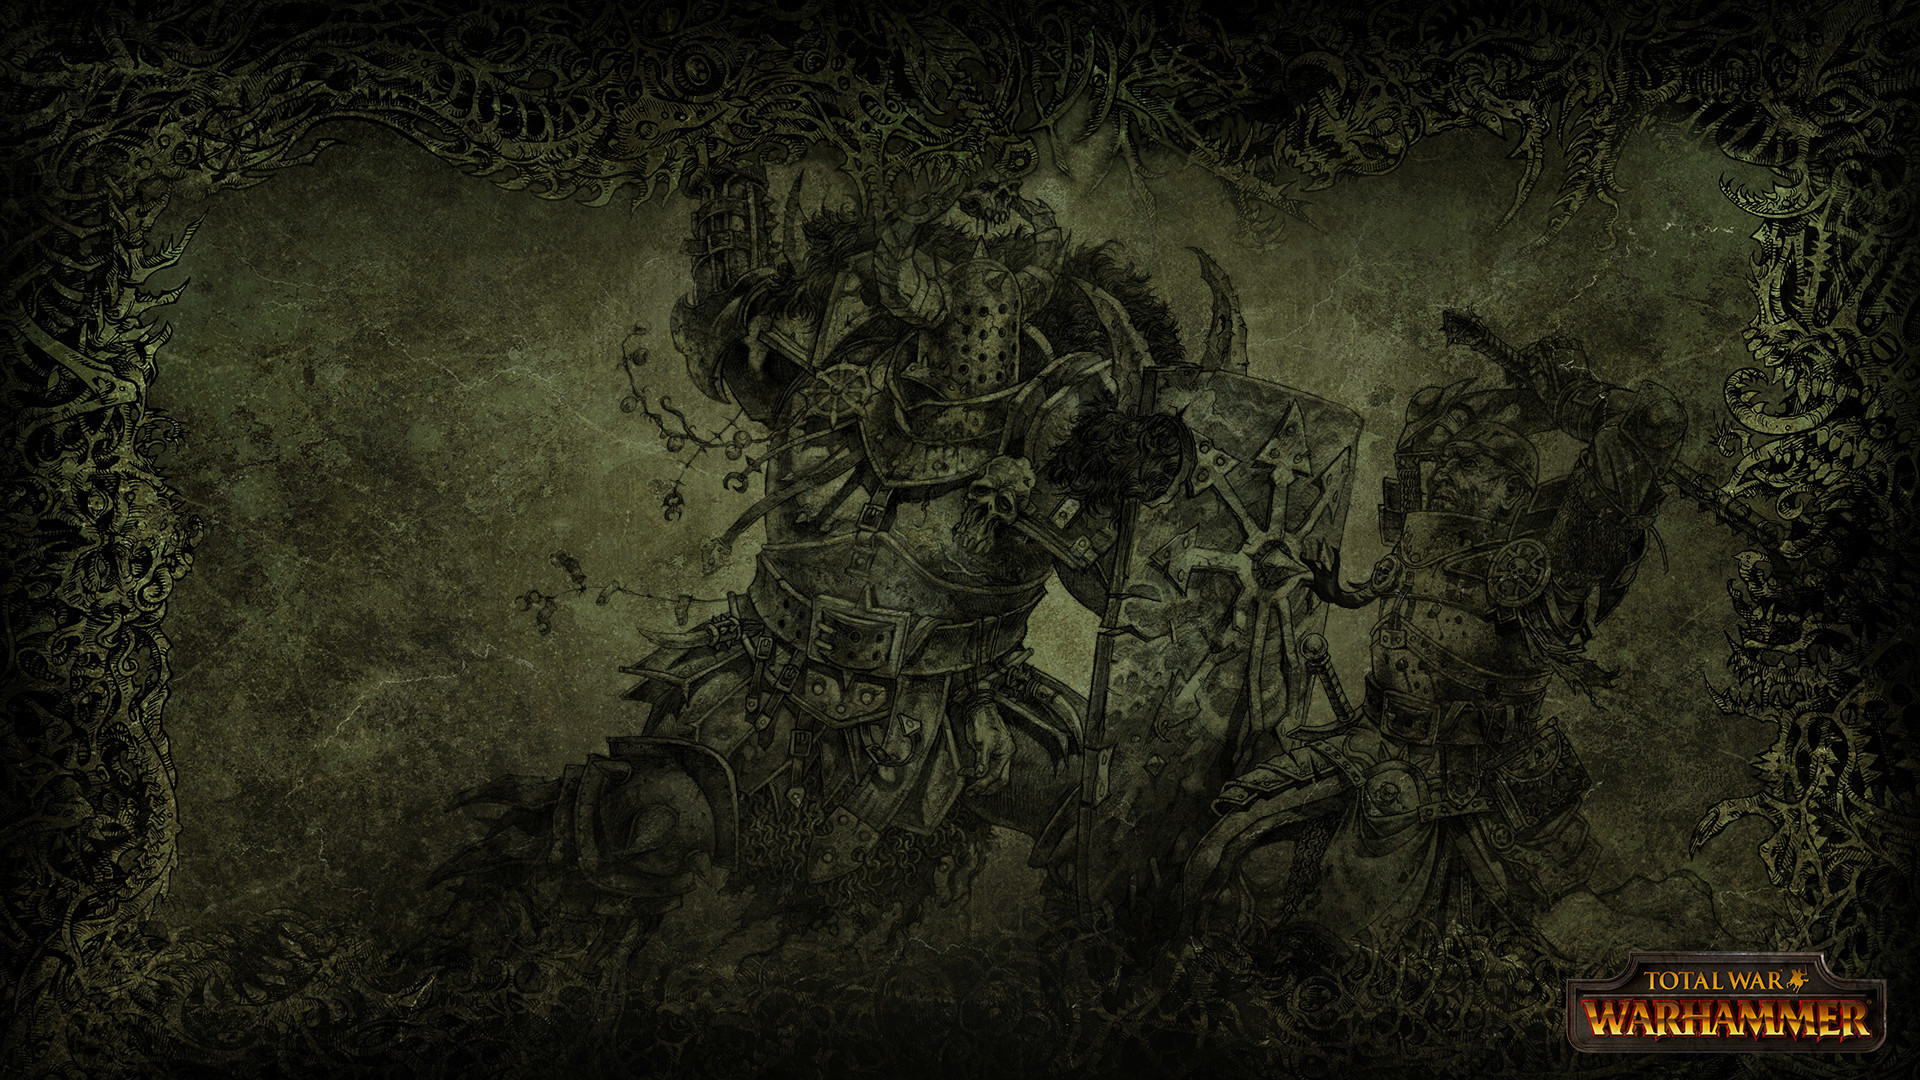 ForumWallpaper2.jpg (1920×1080)   Warhammer Fantasy   Pinterest   Warhammer  fantasy and Total war